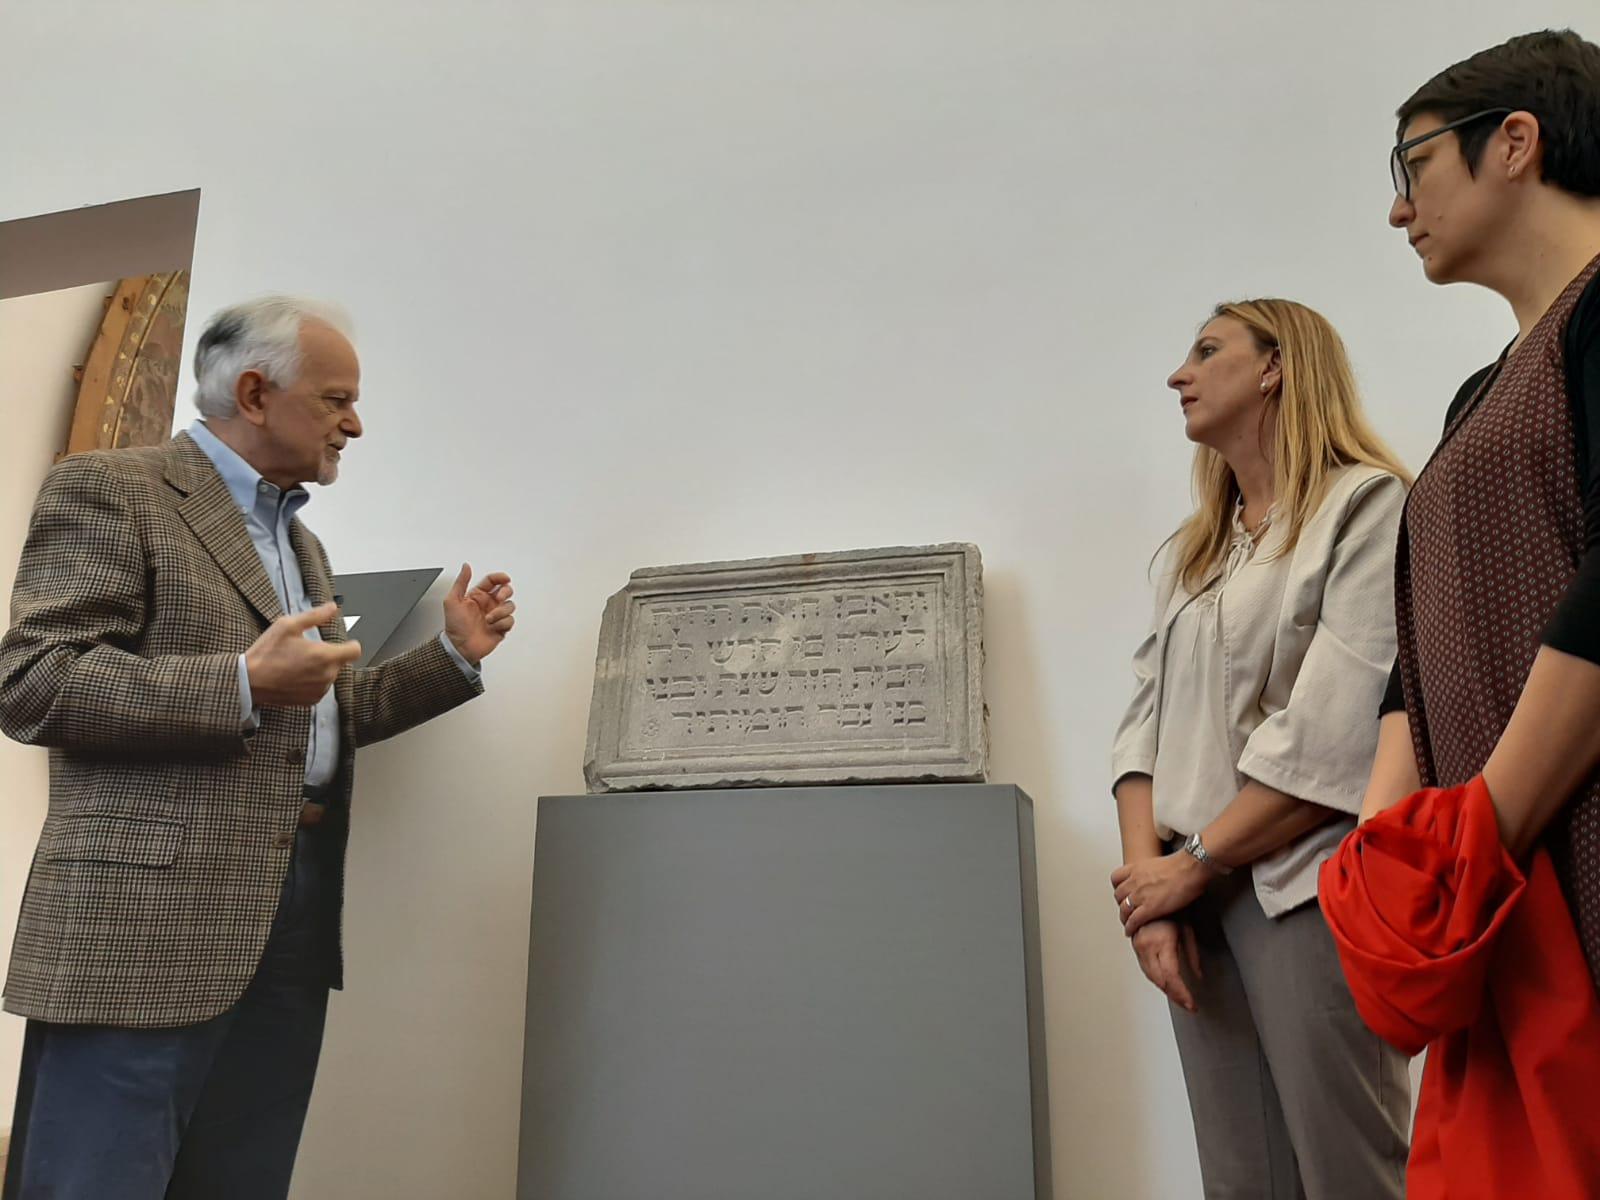 Rimini. Svelata al museo epigrafe in ebraico  del 1510